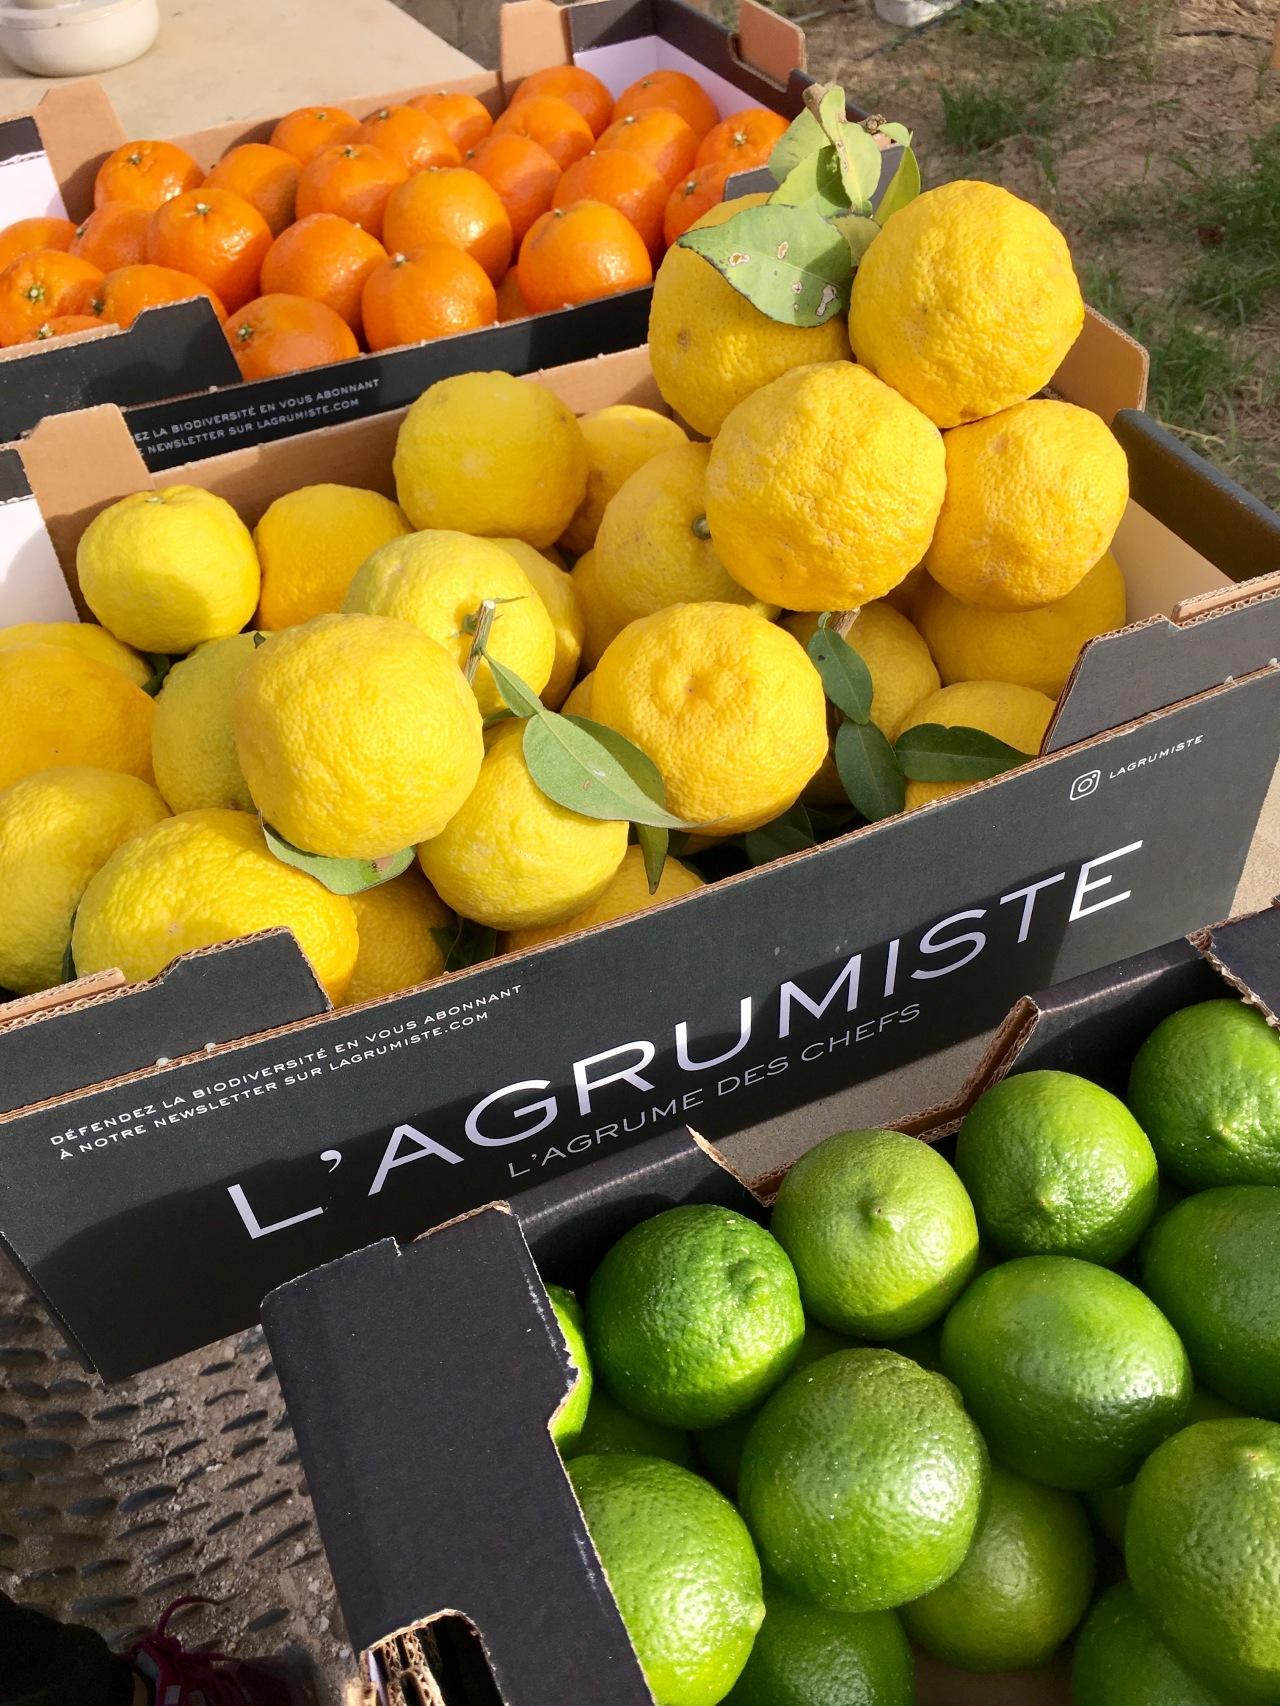 L'AGRUMISTE, LE JARDIN EXTRAORDINAIRE DE LAURENT BOUGHABA –MAROC